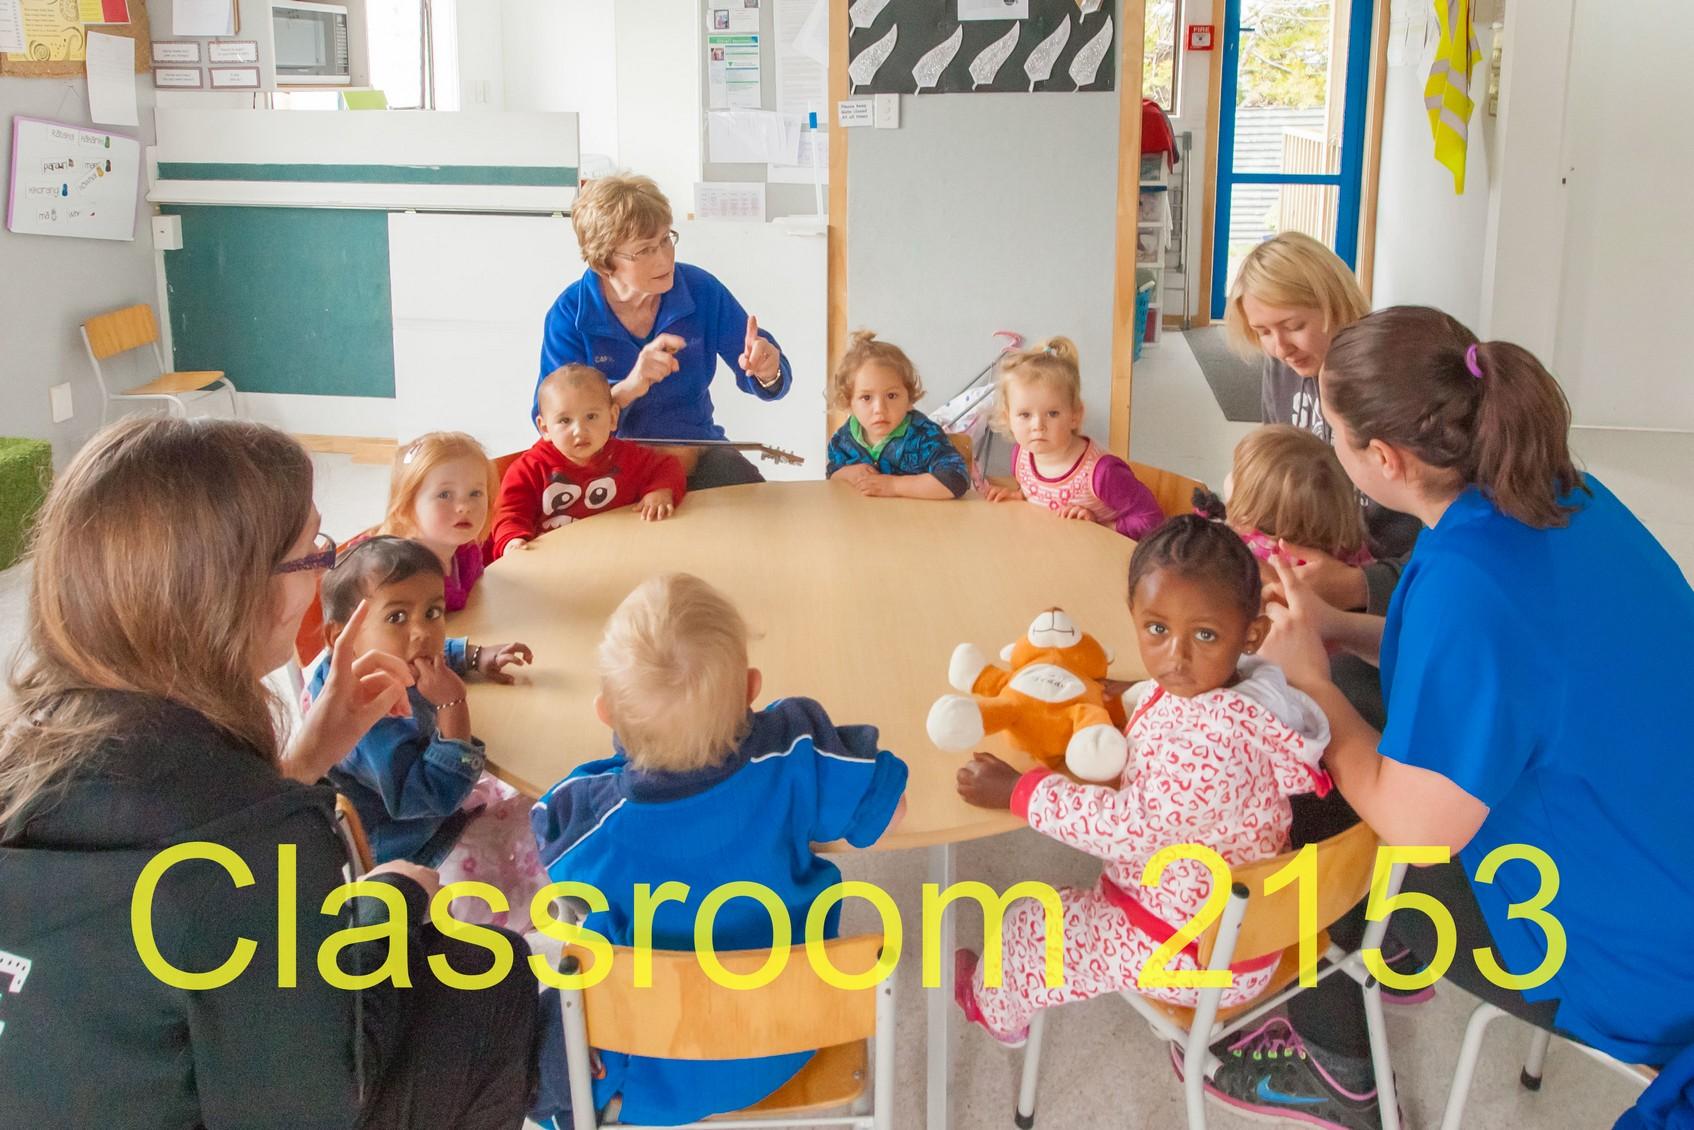 Classroom 2153